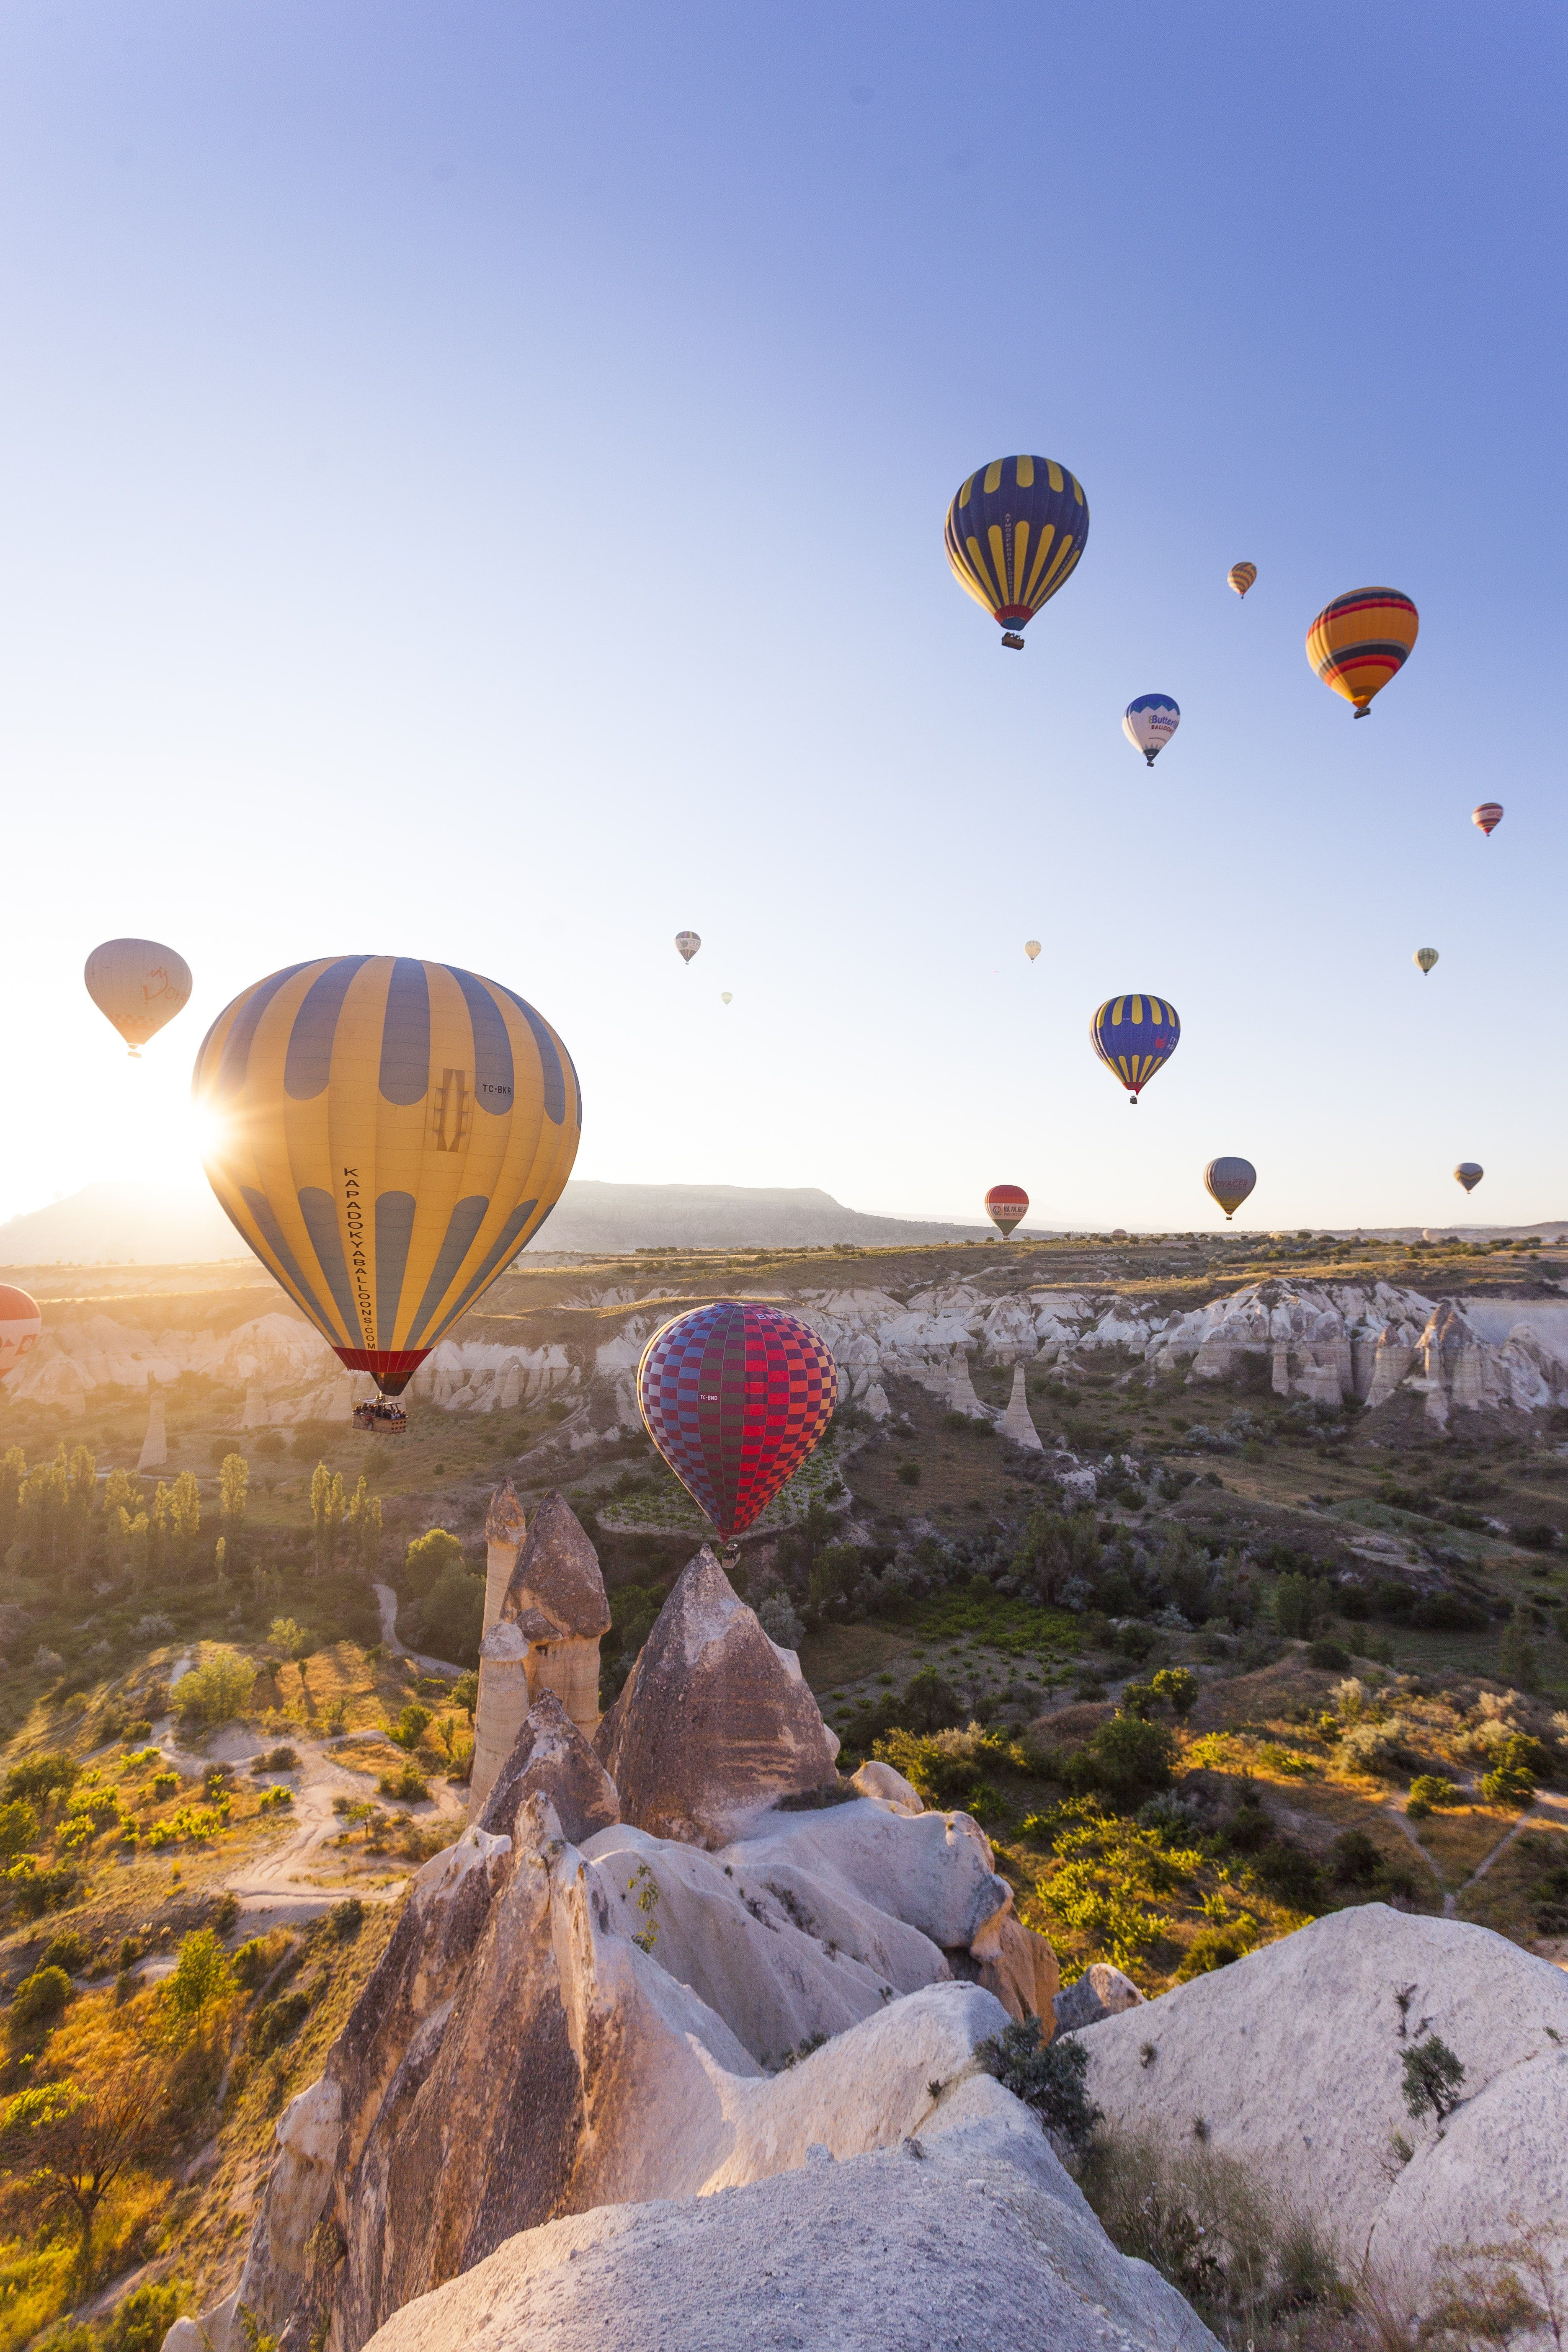 8 Incredible Destinations for a Hot Air Balloon Ride